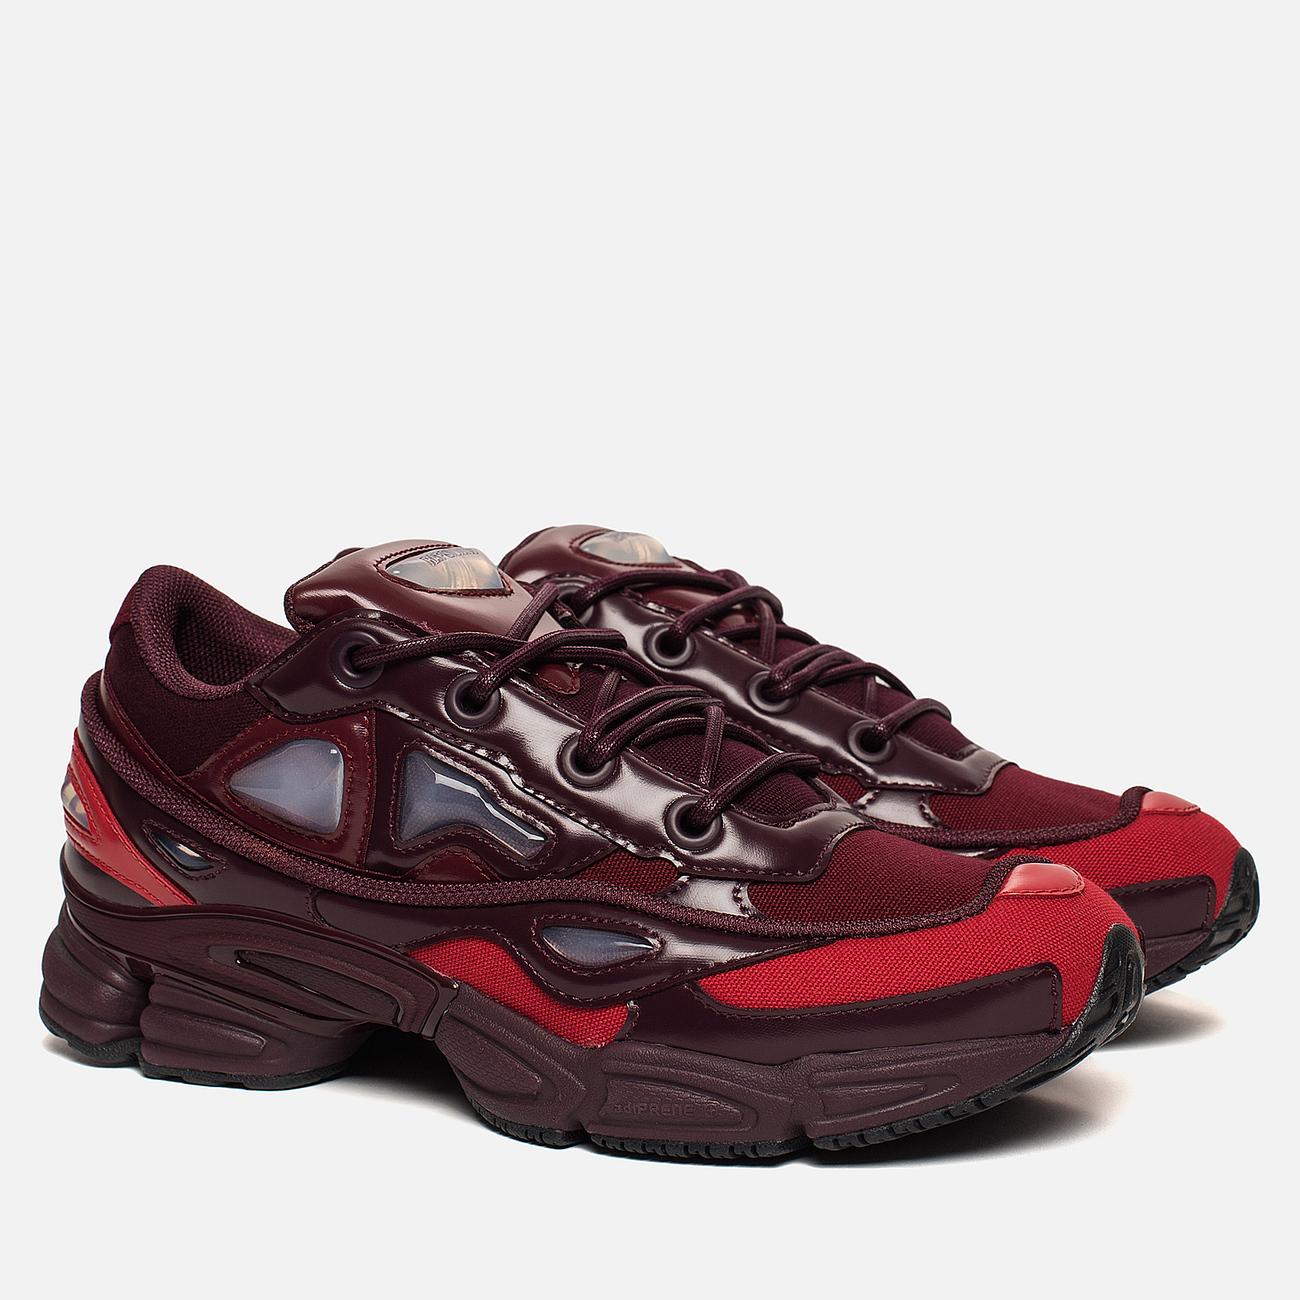 Кроссовки adidas Originals x Raf Simons Ozweego III Core Burgundy/Maroon/Scarlet